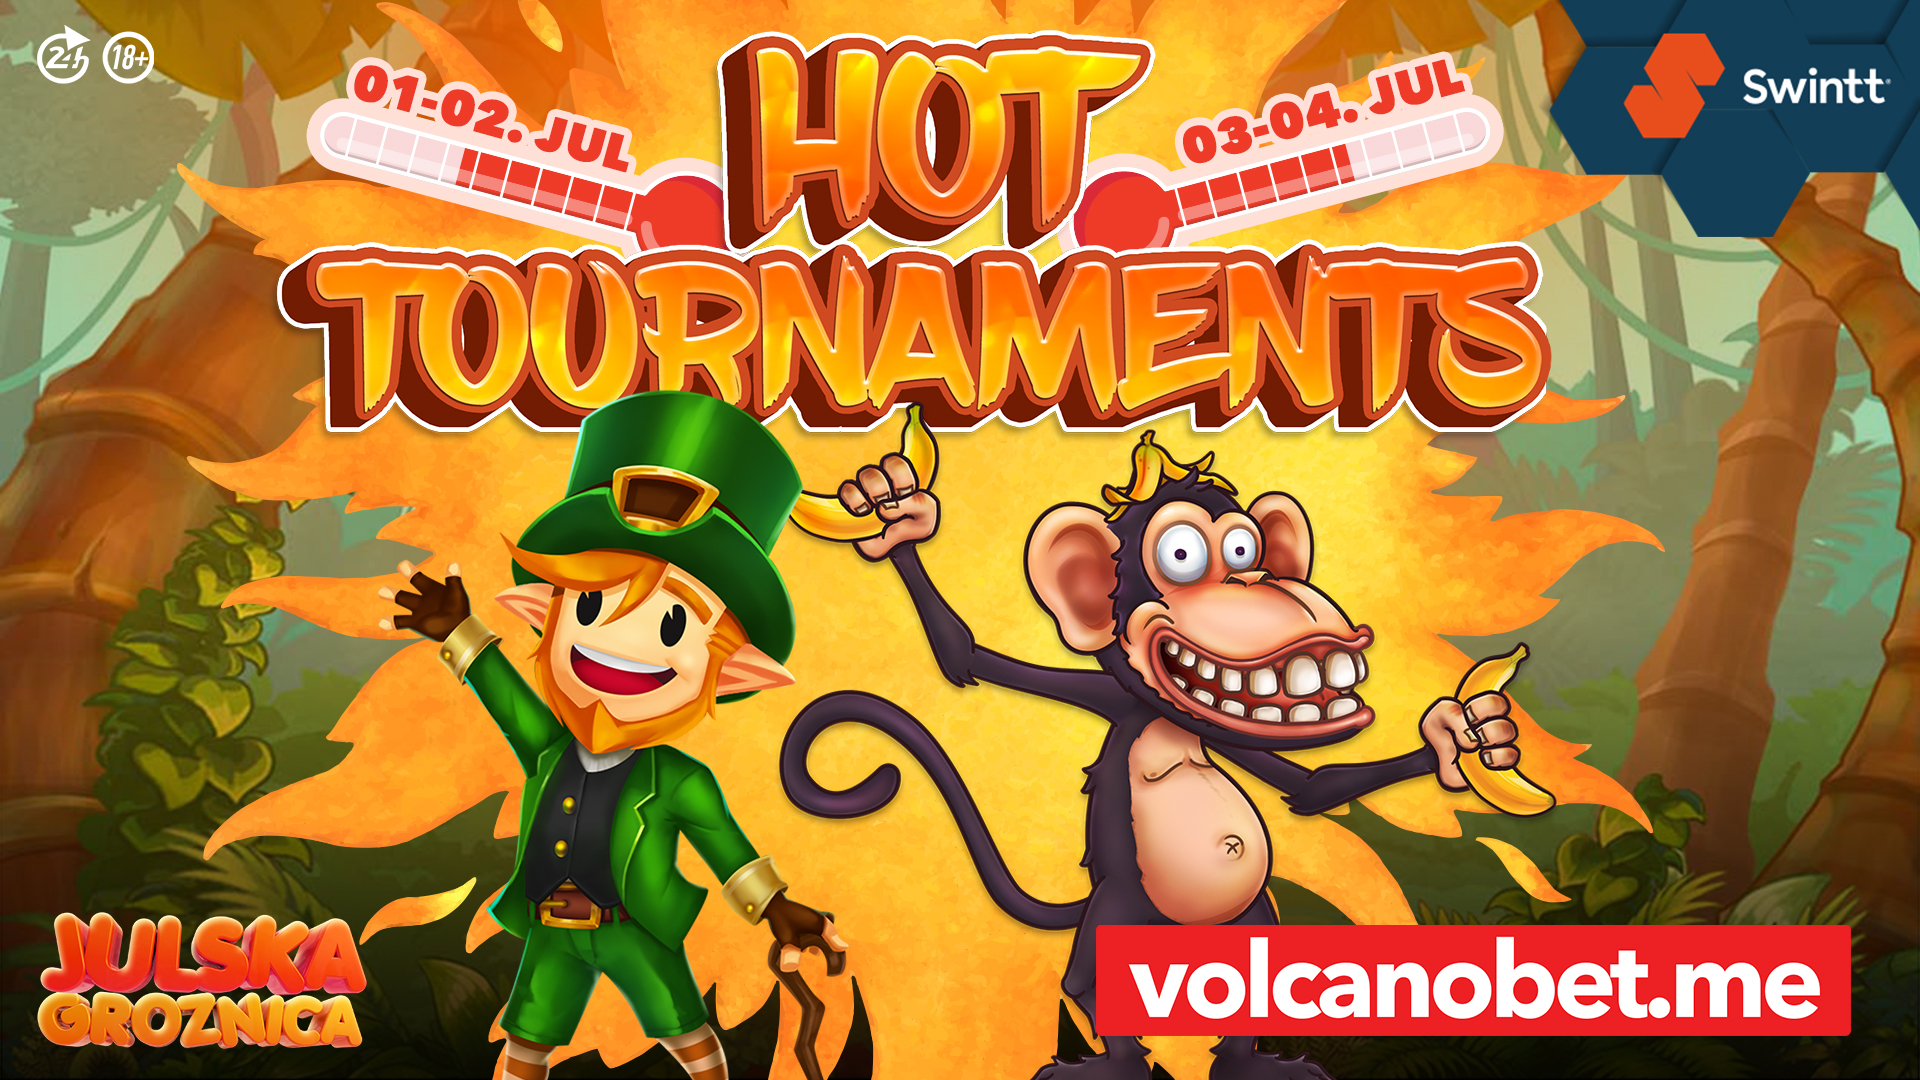 Swintt Hot Tournaments